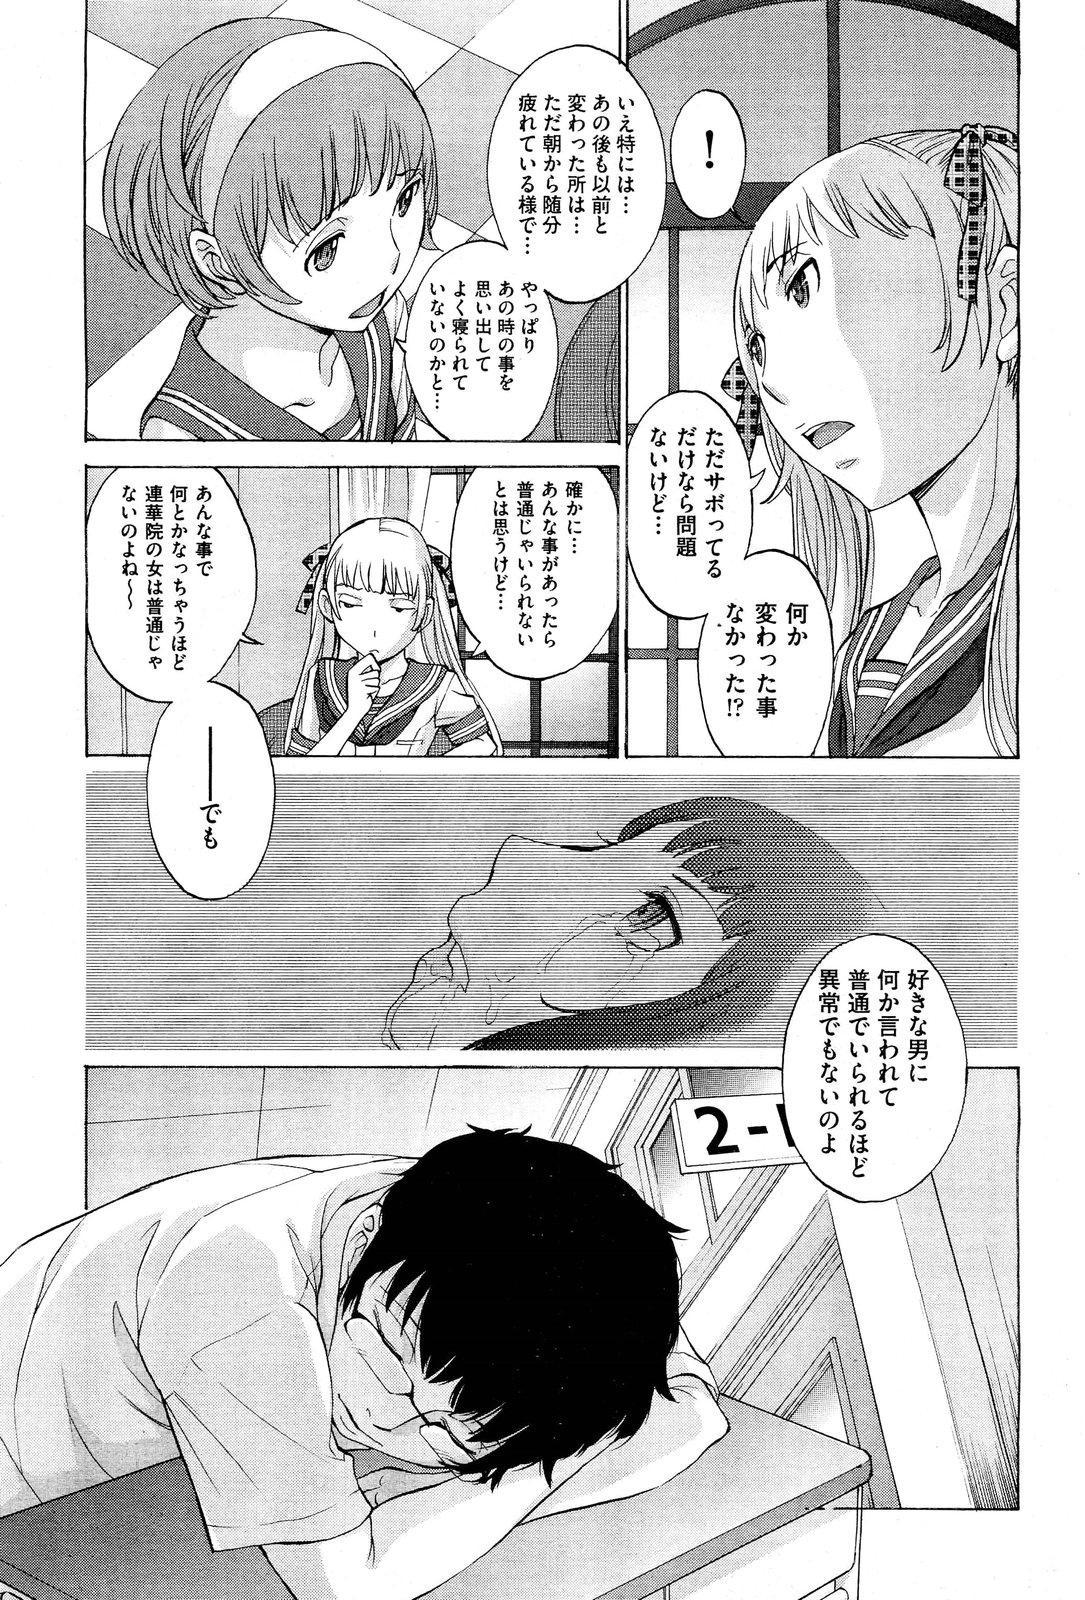 Hanazono 153